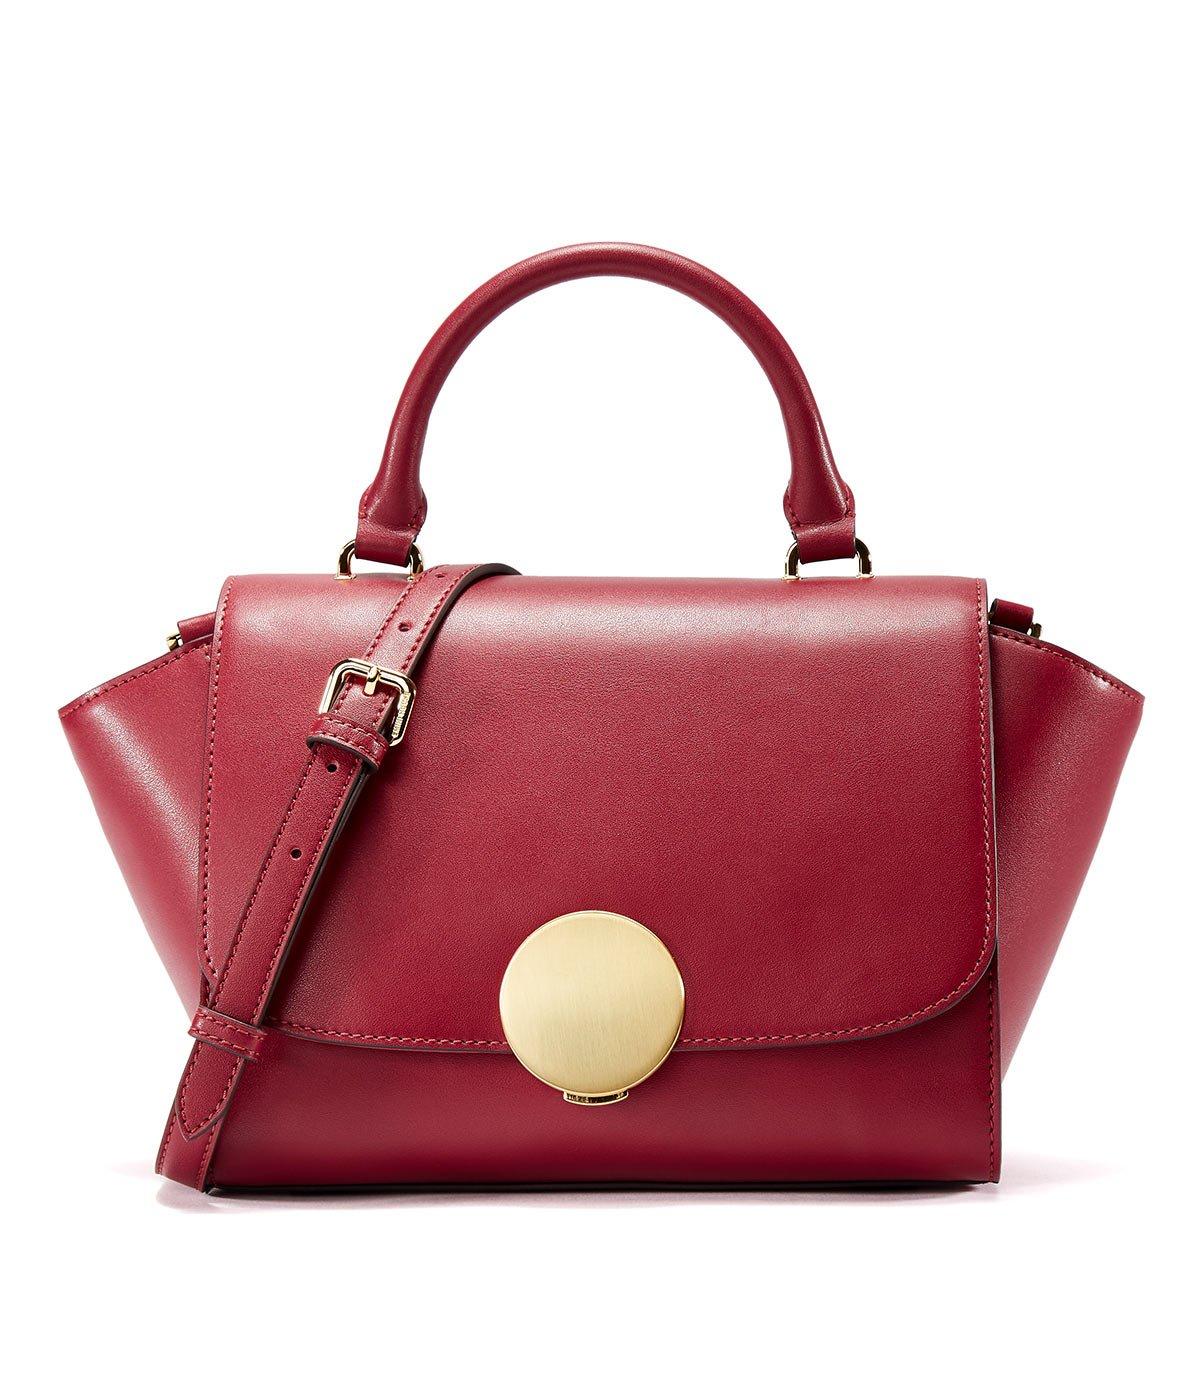 EMINI HOUSE Vintage Trapeze Bag with Round Hardware Closure Women Handbag-wine red